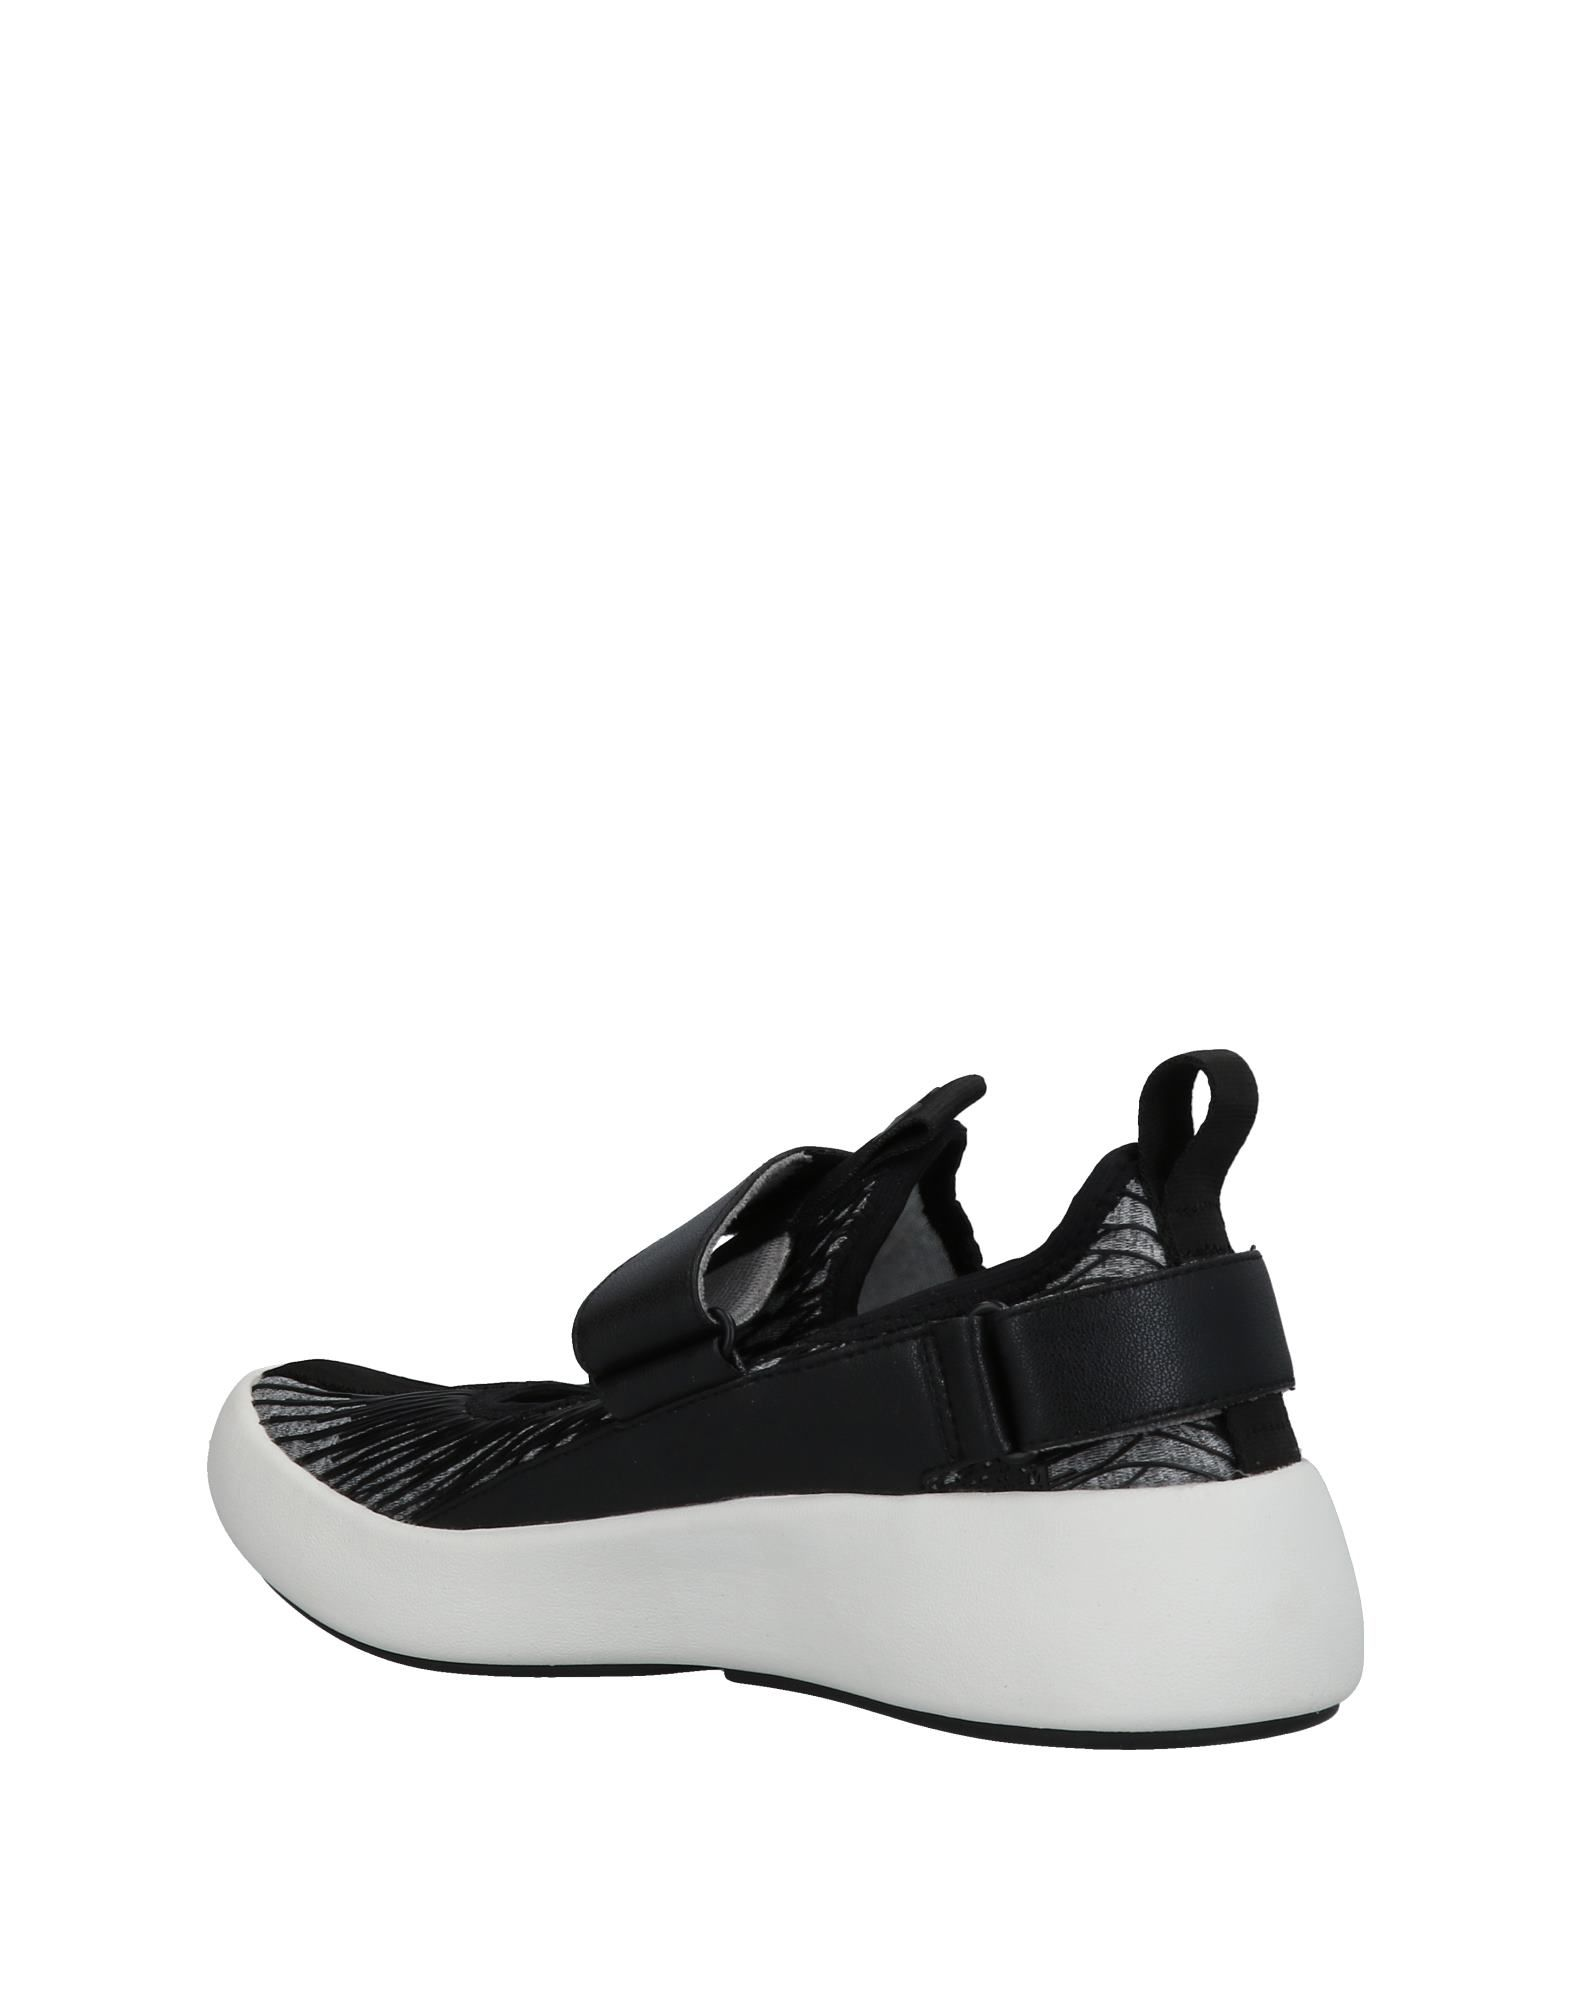 United Nude Sneakers Damen  11434973CA Gute Qualität beliebte Schuhe